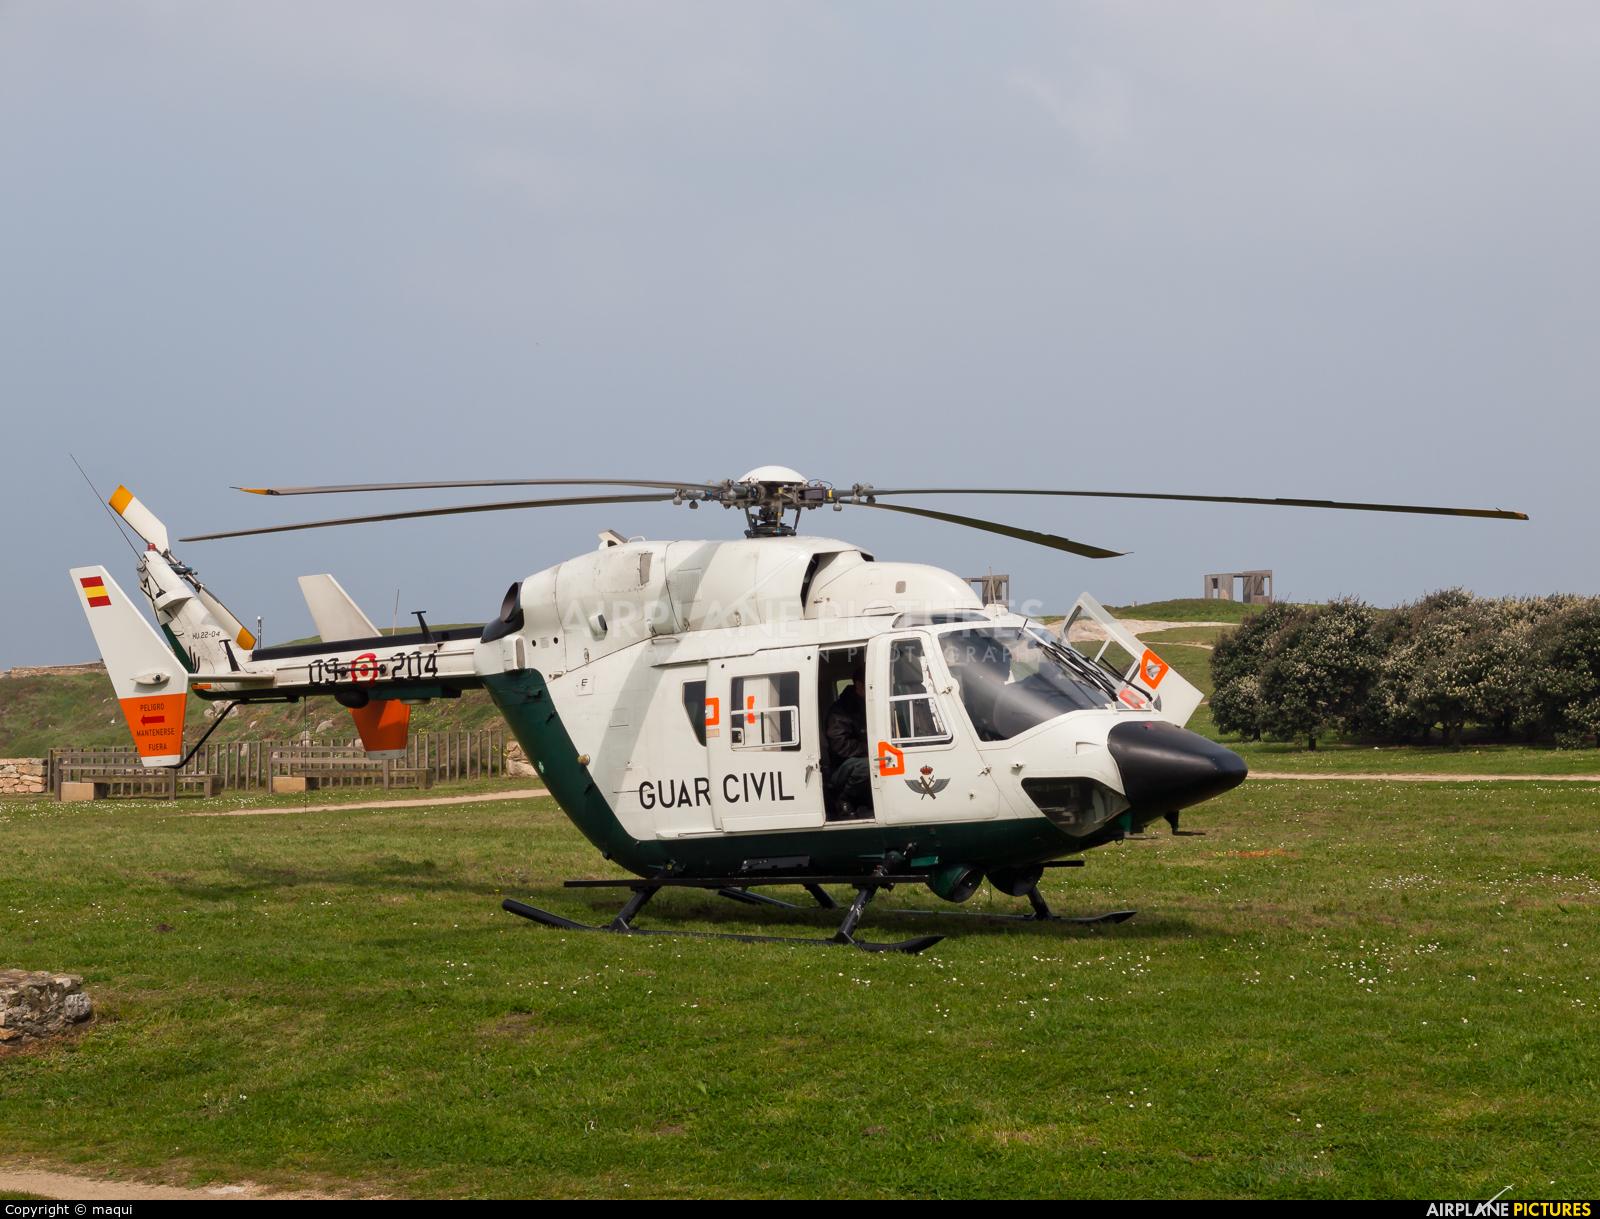 Spain - Guardia Civil HU.22-04 aircraft at La Coruña - Torre de Hercules